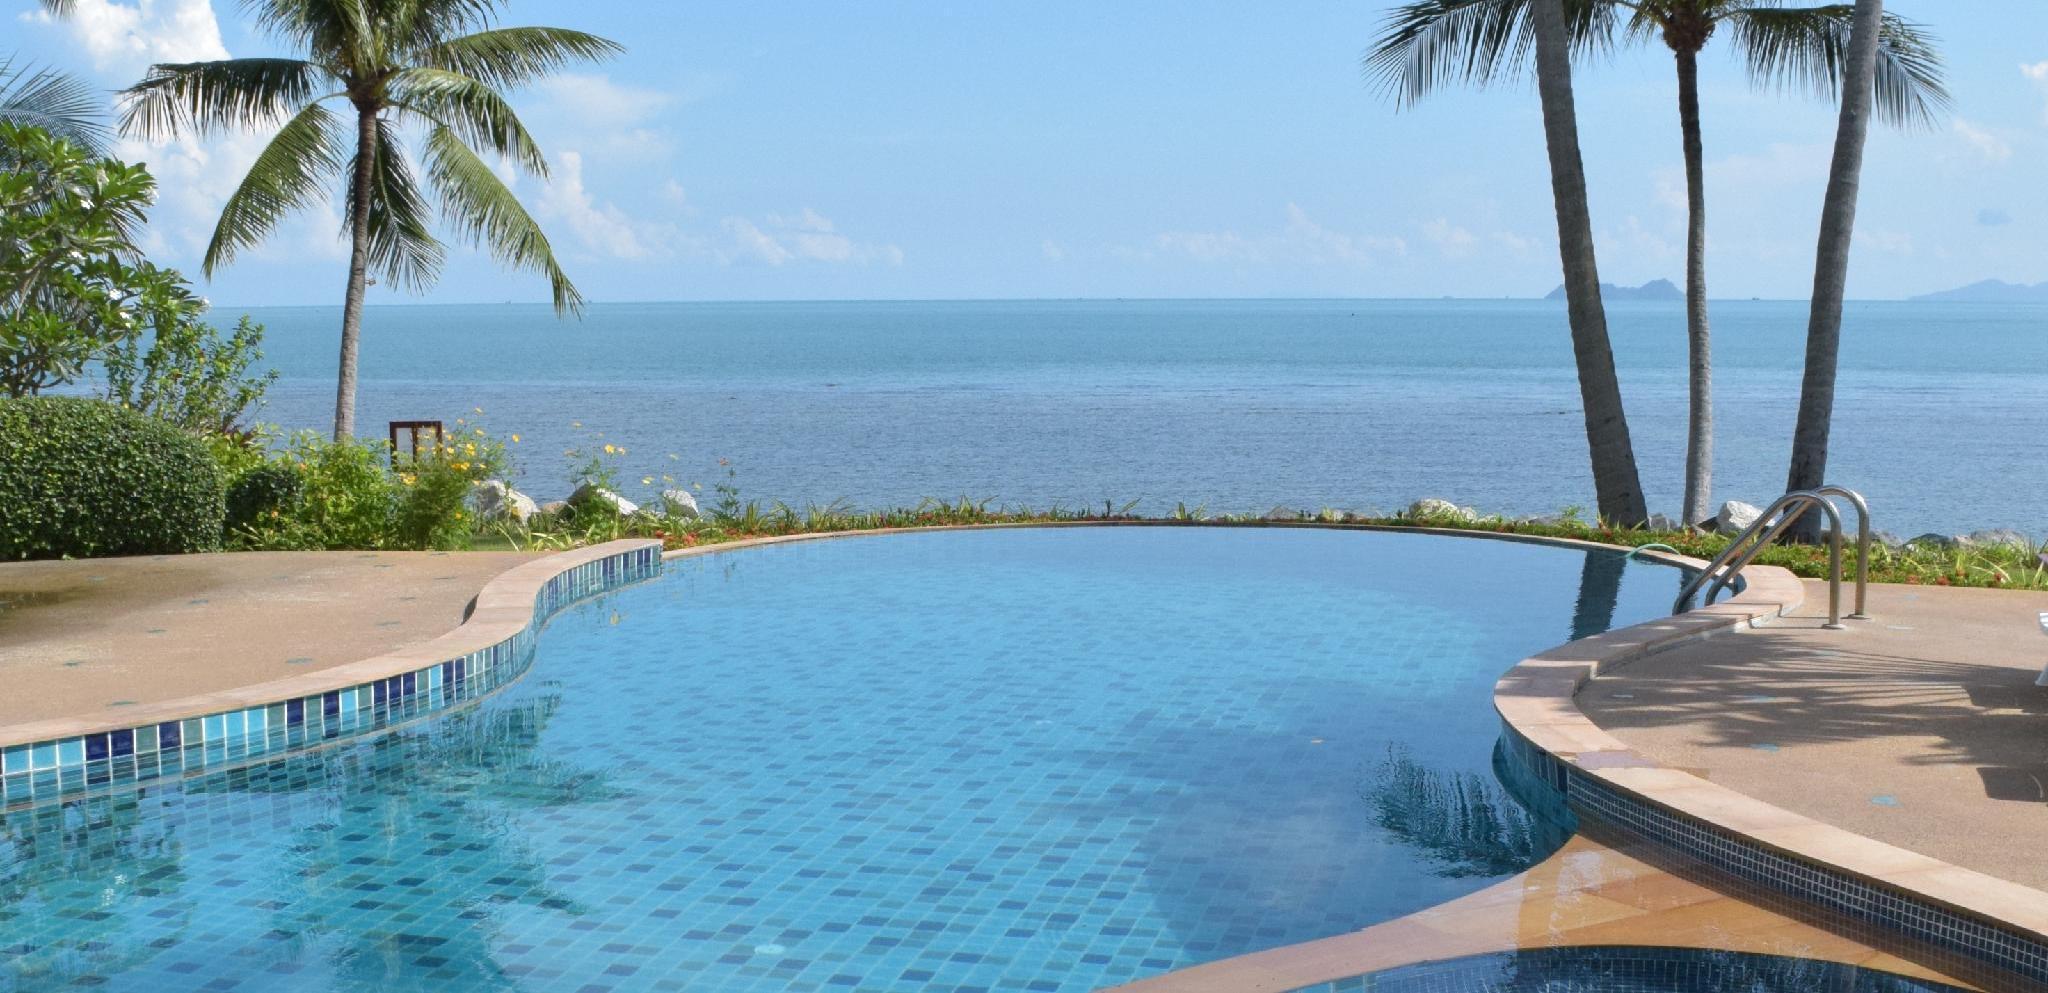 Banyan Pool Villa 1 Bang Por Beach วิลลา 4 ห้องนอน 5 ห้องน้ำส่วนตัว ขนาด 289 ตร.ม. – บางปอ